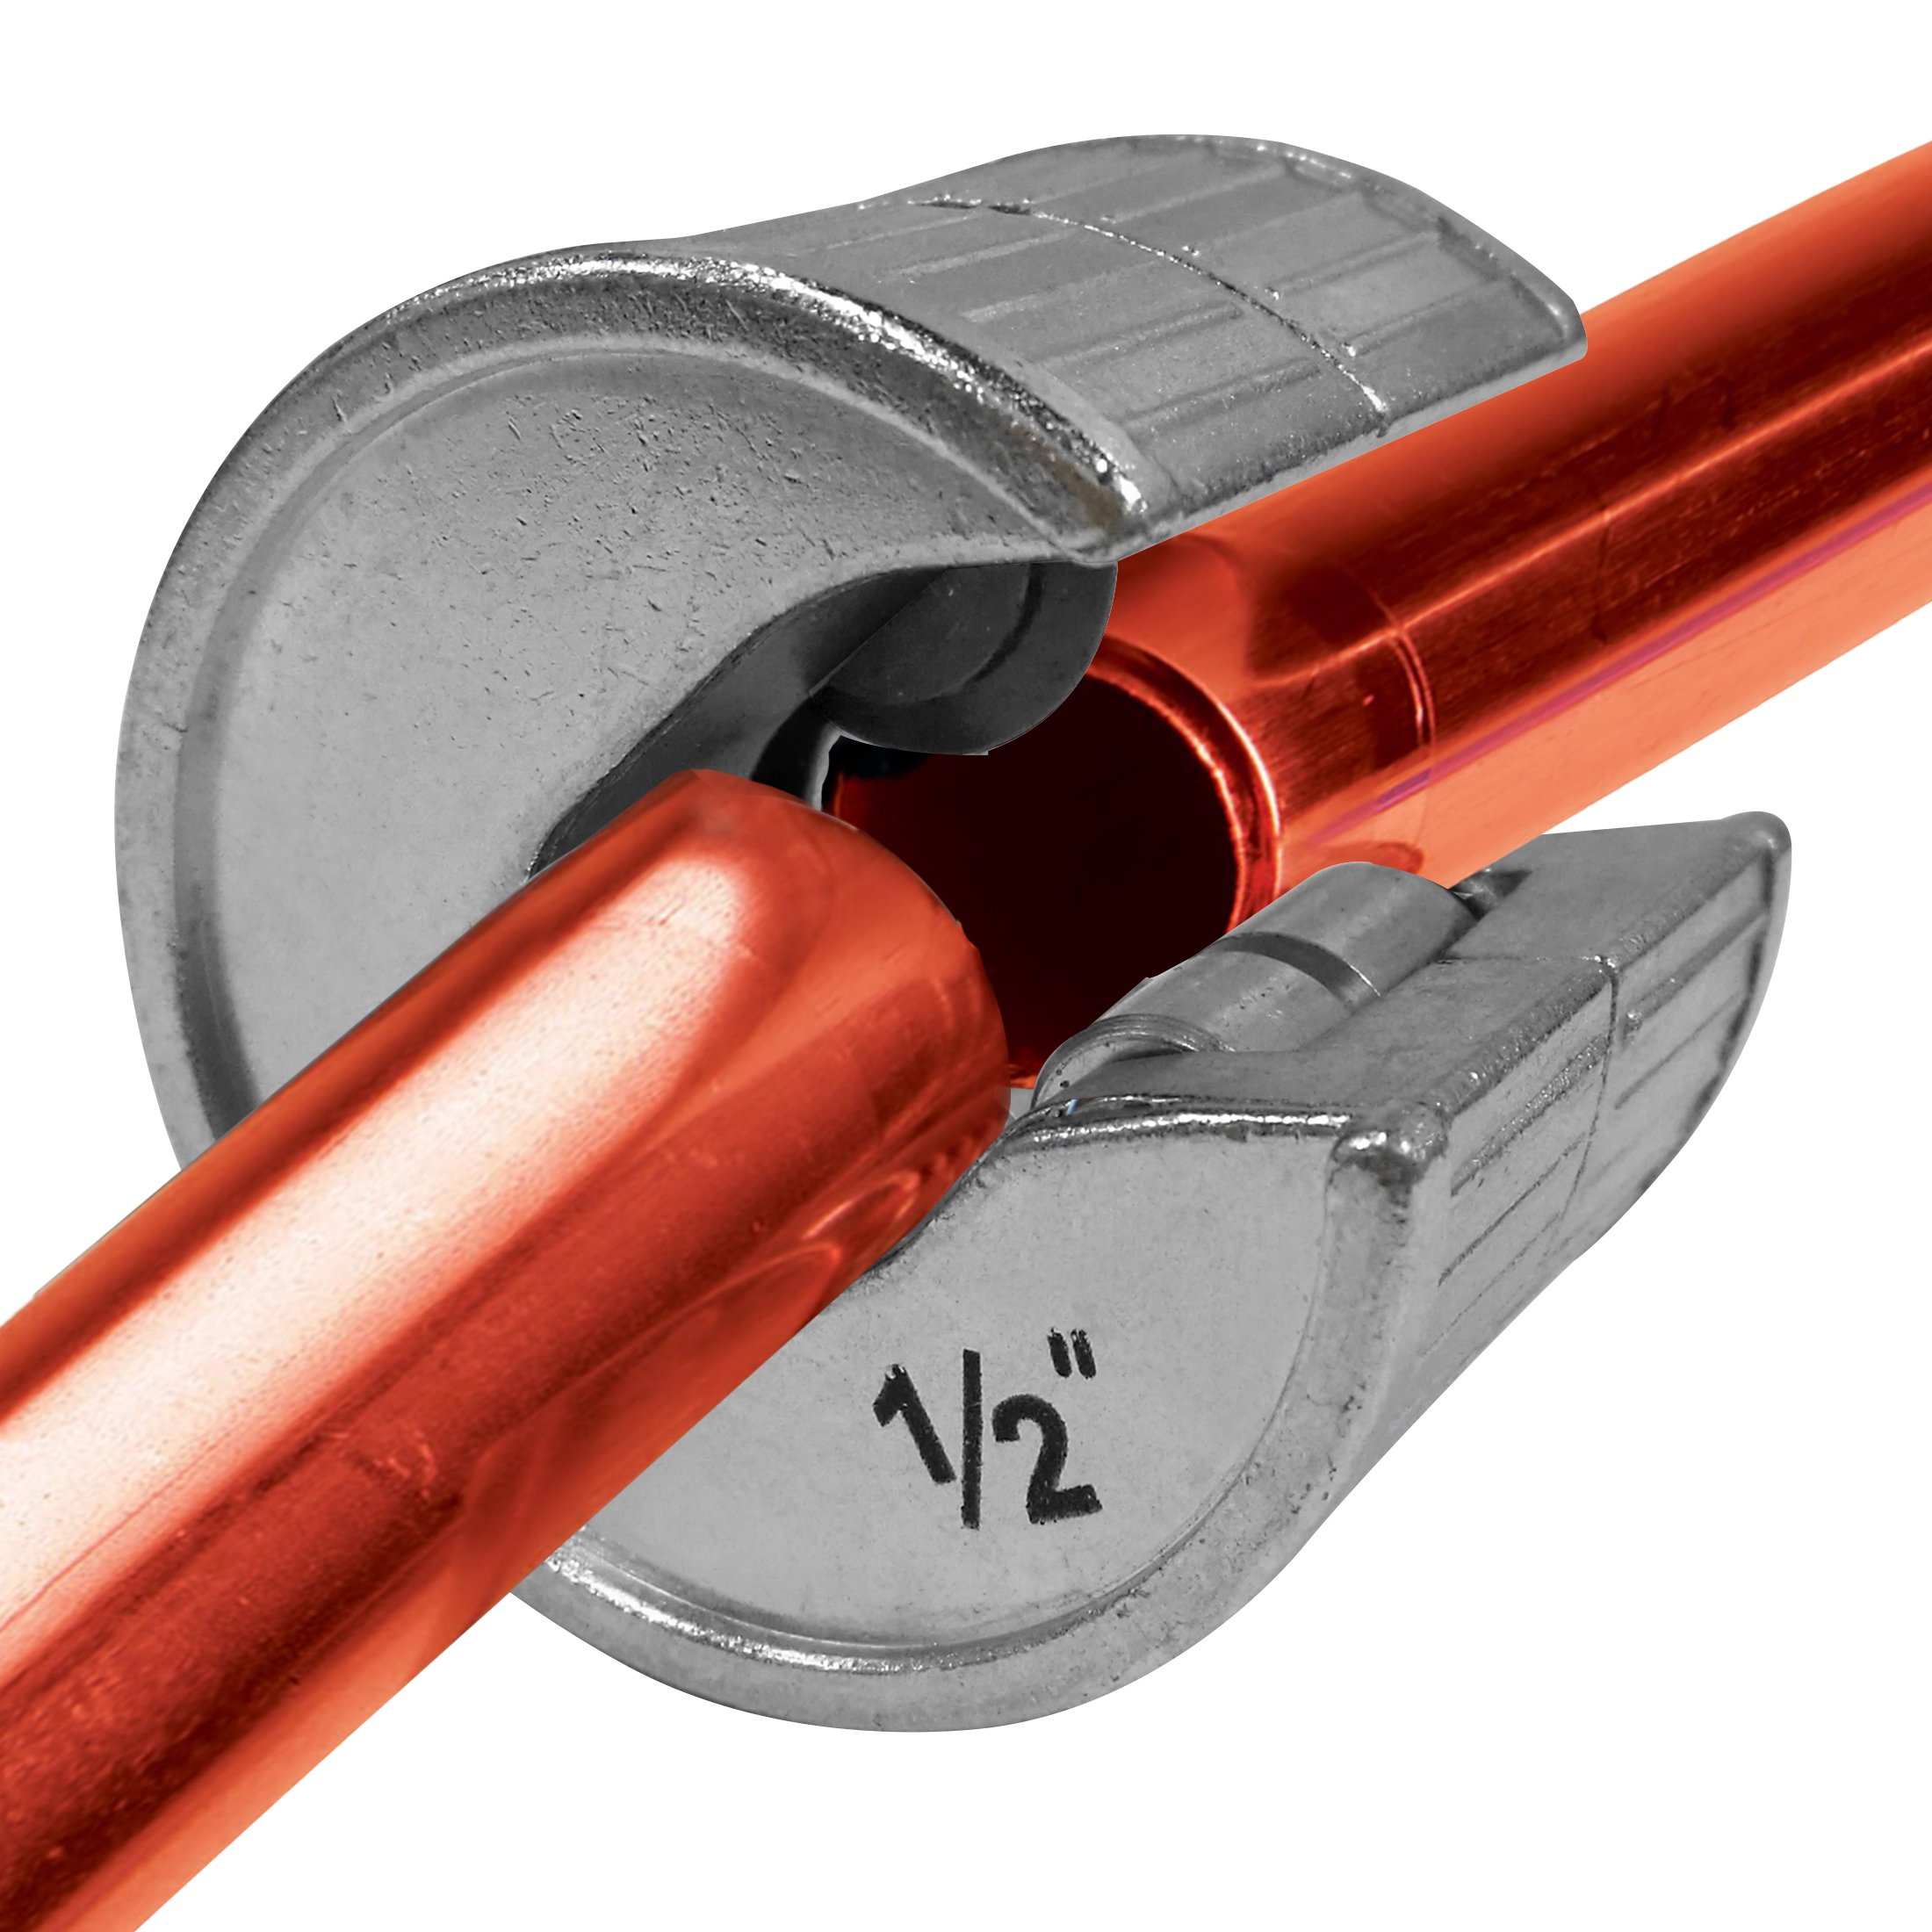 HAUTMEC Plumbing Auto Cut Tube Cutter 1/2'' for Copper Pipe 1/2'' PL0003